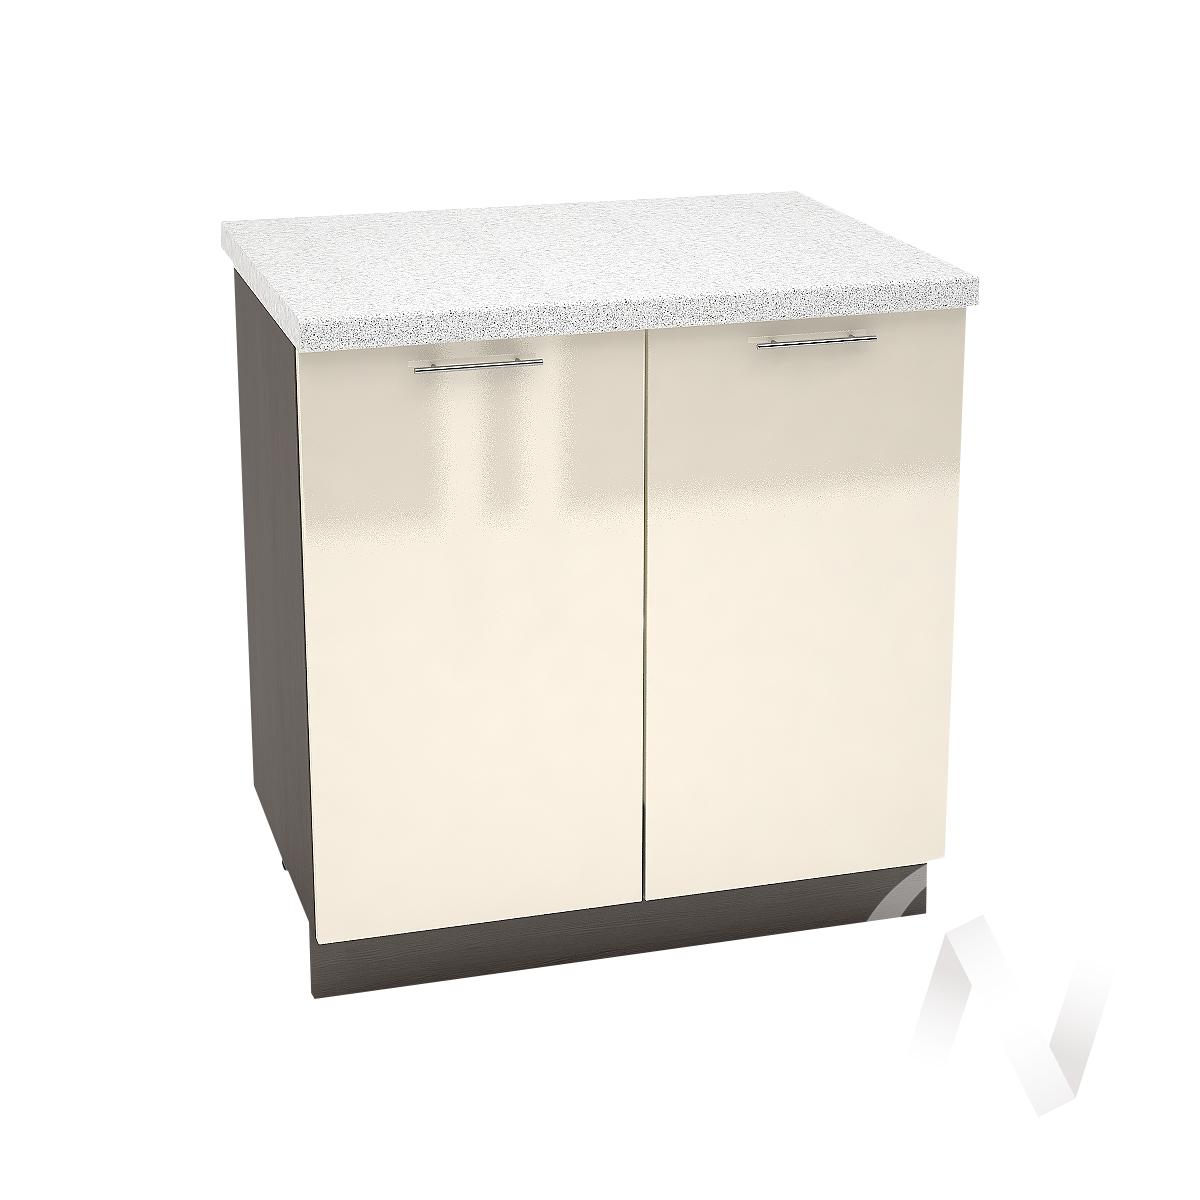 "Кухня ""Валерия-М"": Шкаф нижний 800, ШН 800 (Ваниль глянец/корпус венге)"